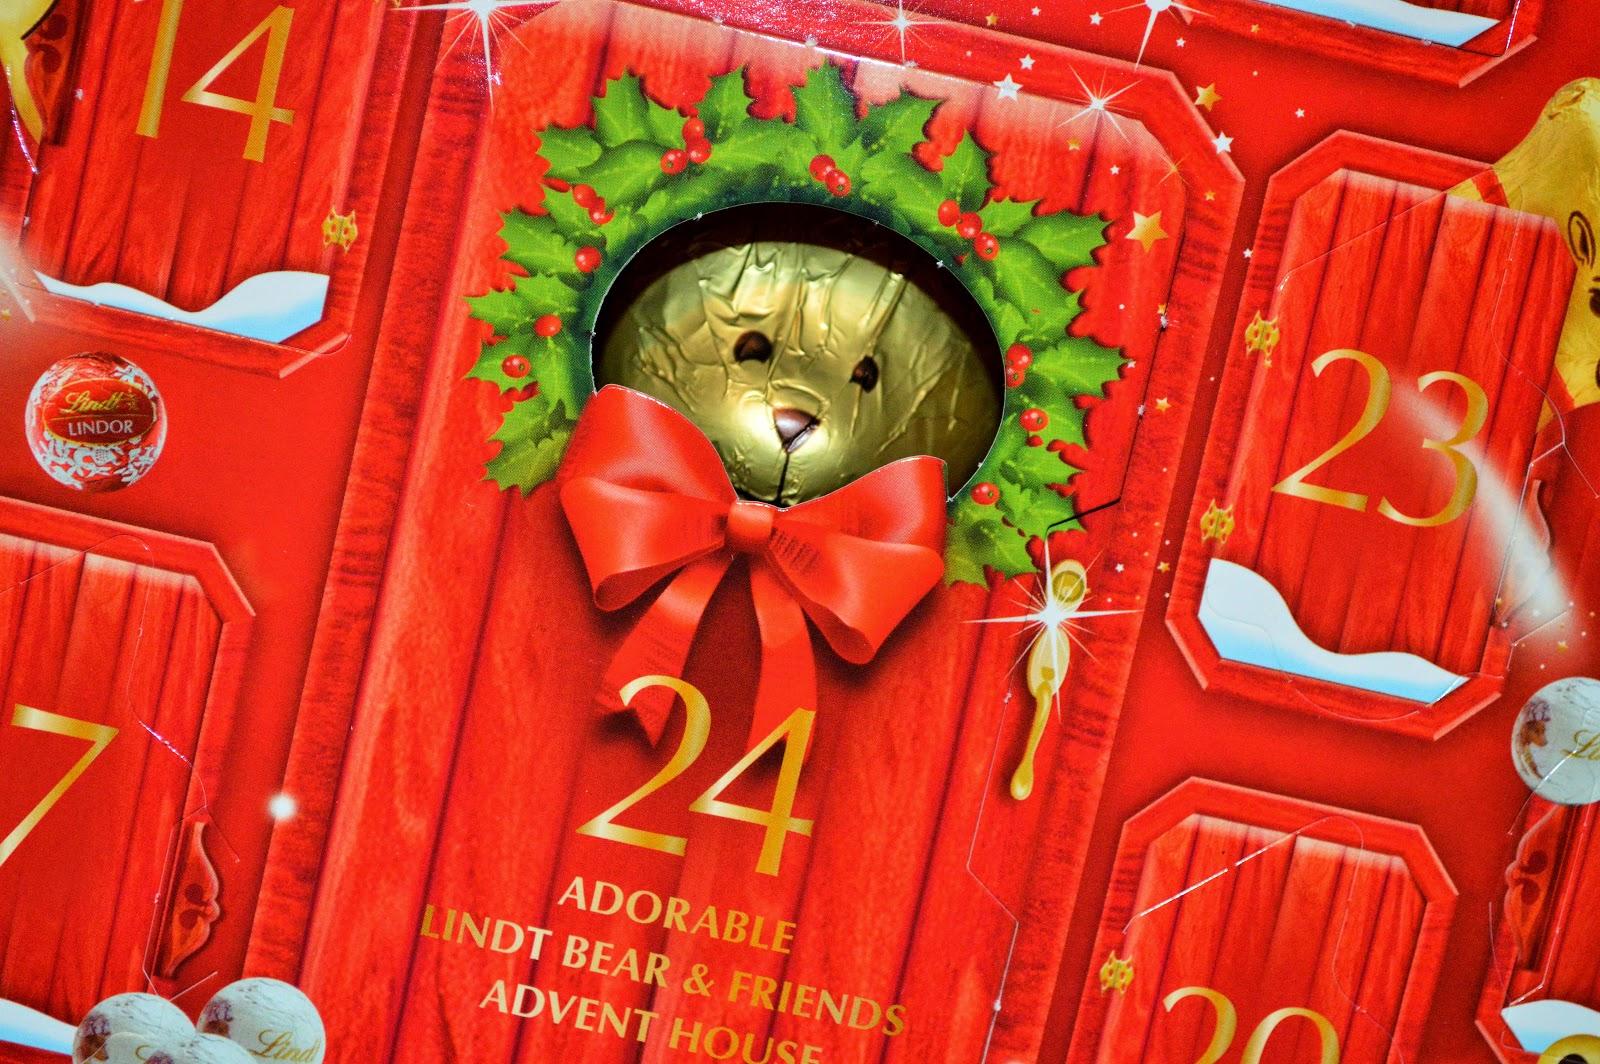 Lindt Bear Adorable Advent Calendar